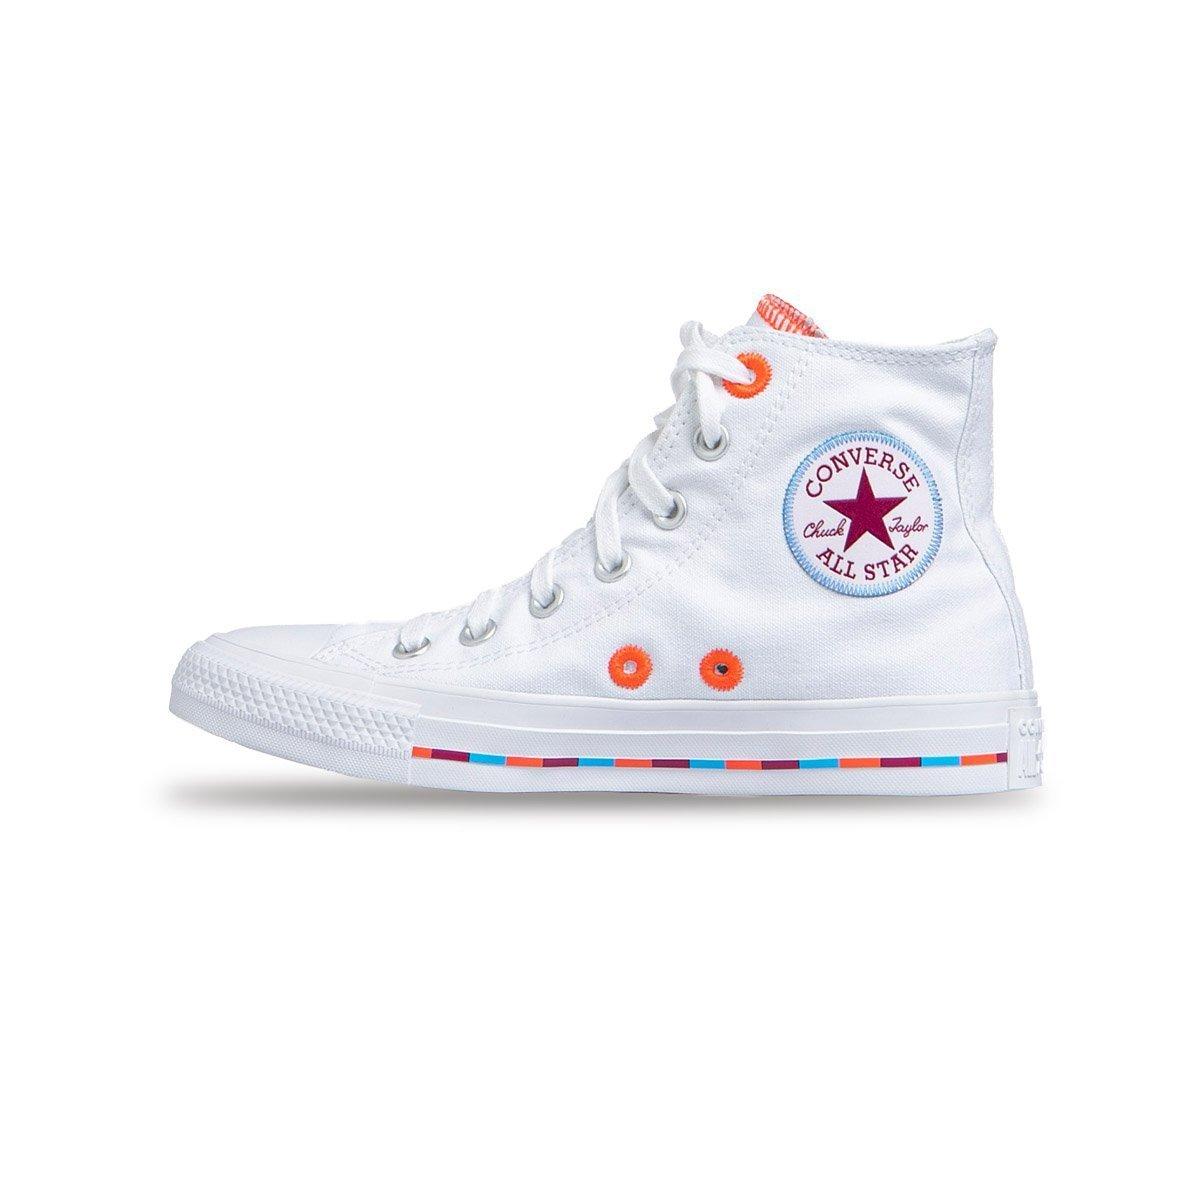 Sneakers buty damskie Converse Chuck Taylor All Star białe (566718C)